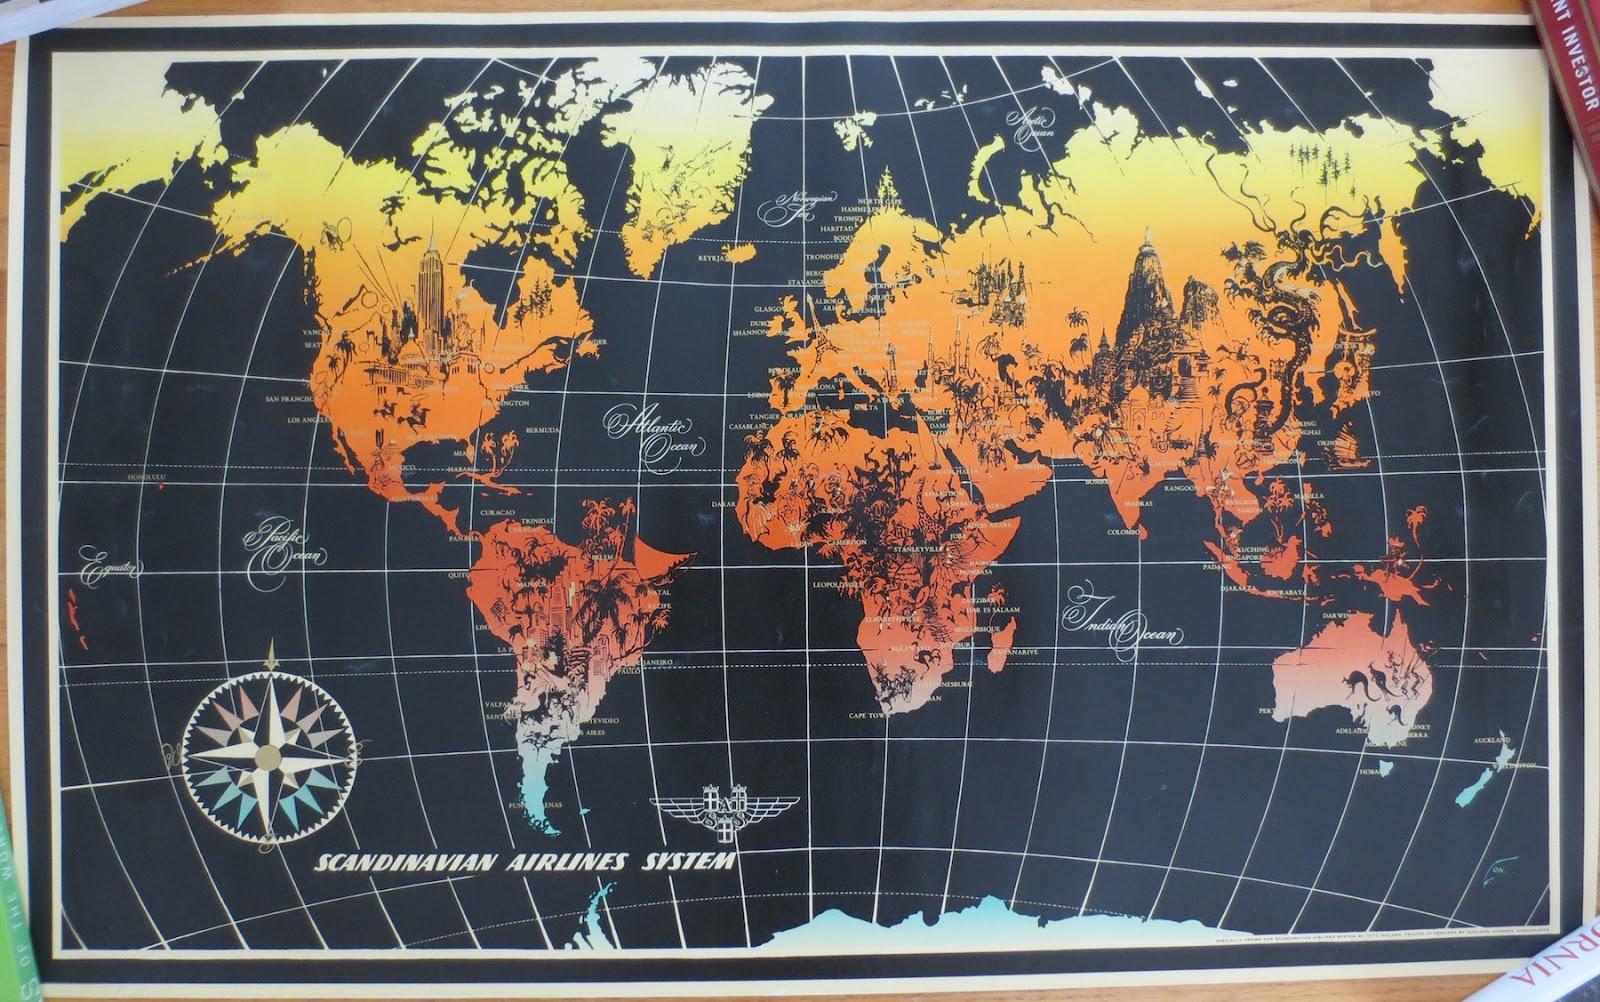 sas world map 29x18 inches 1 original